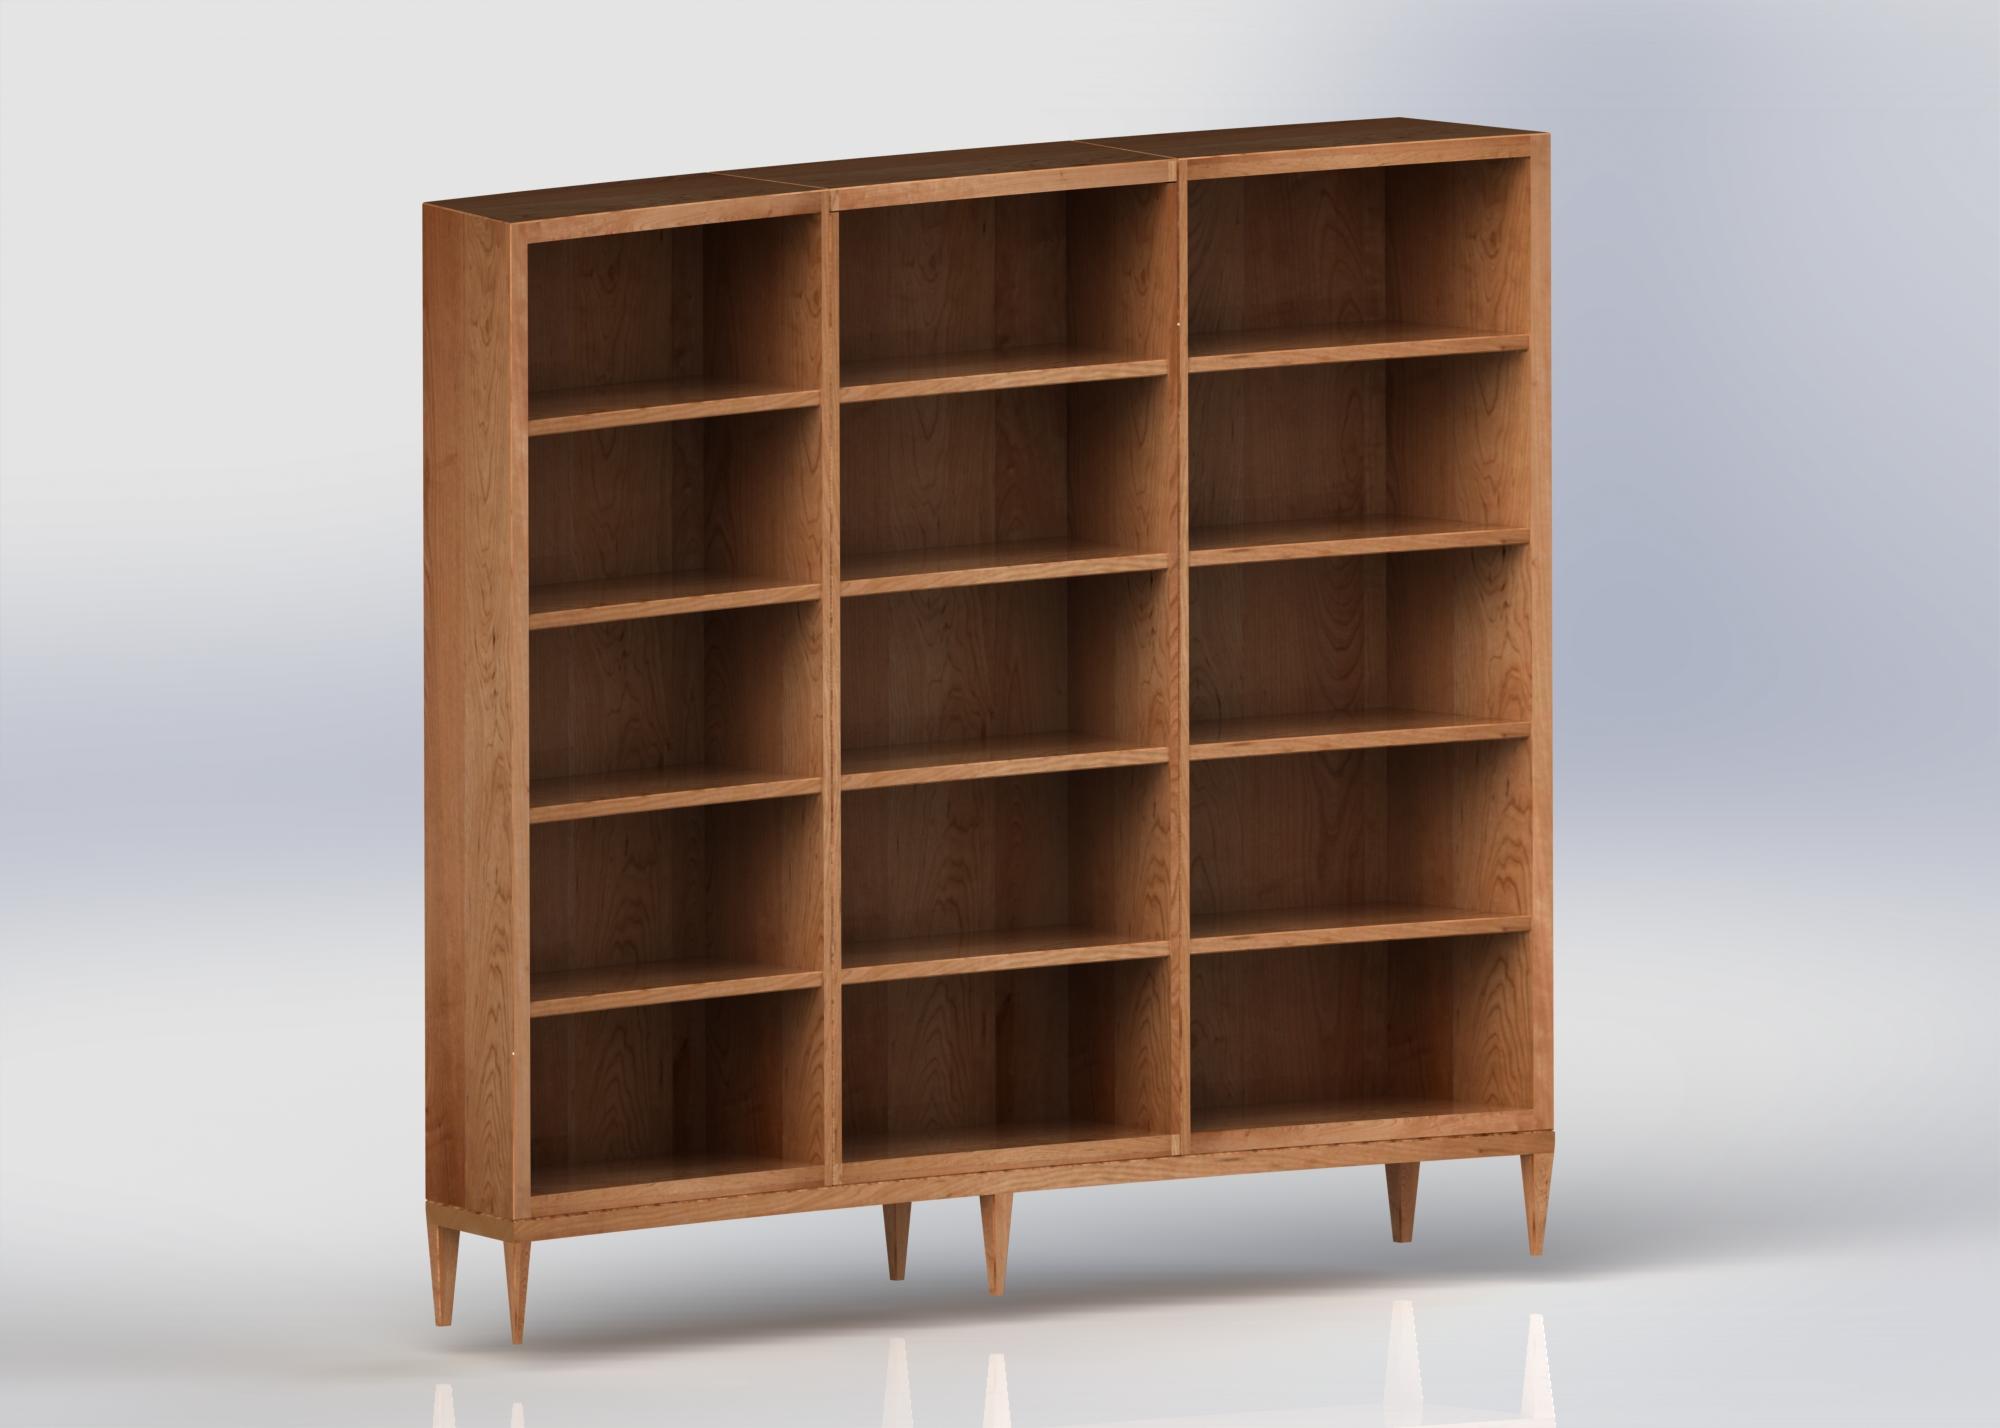 3_Part_Curved_Bookshelf_6_Small_Legs.JPG